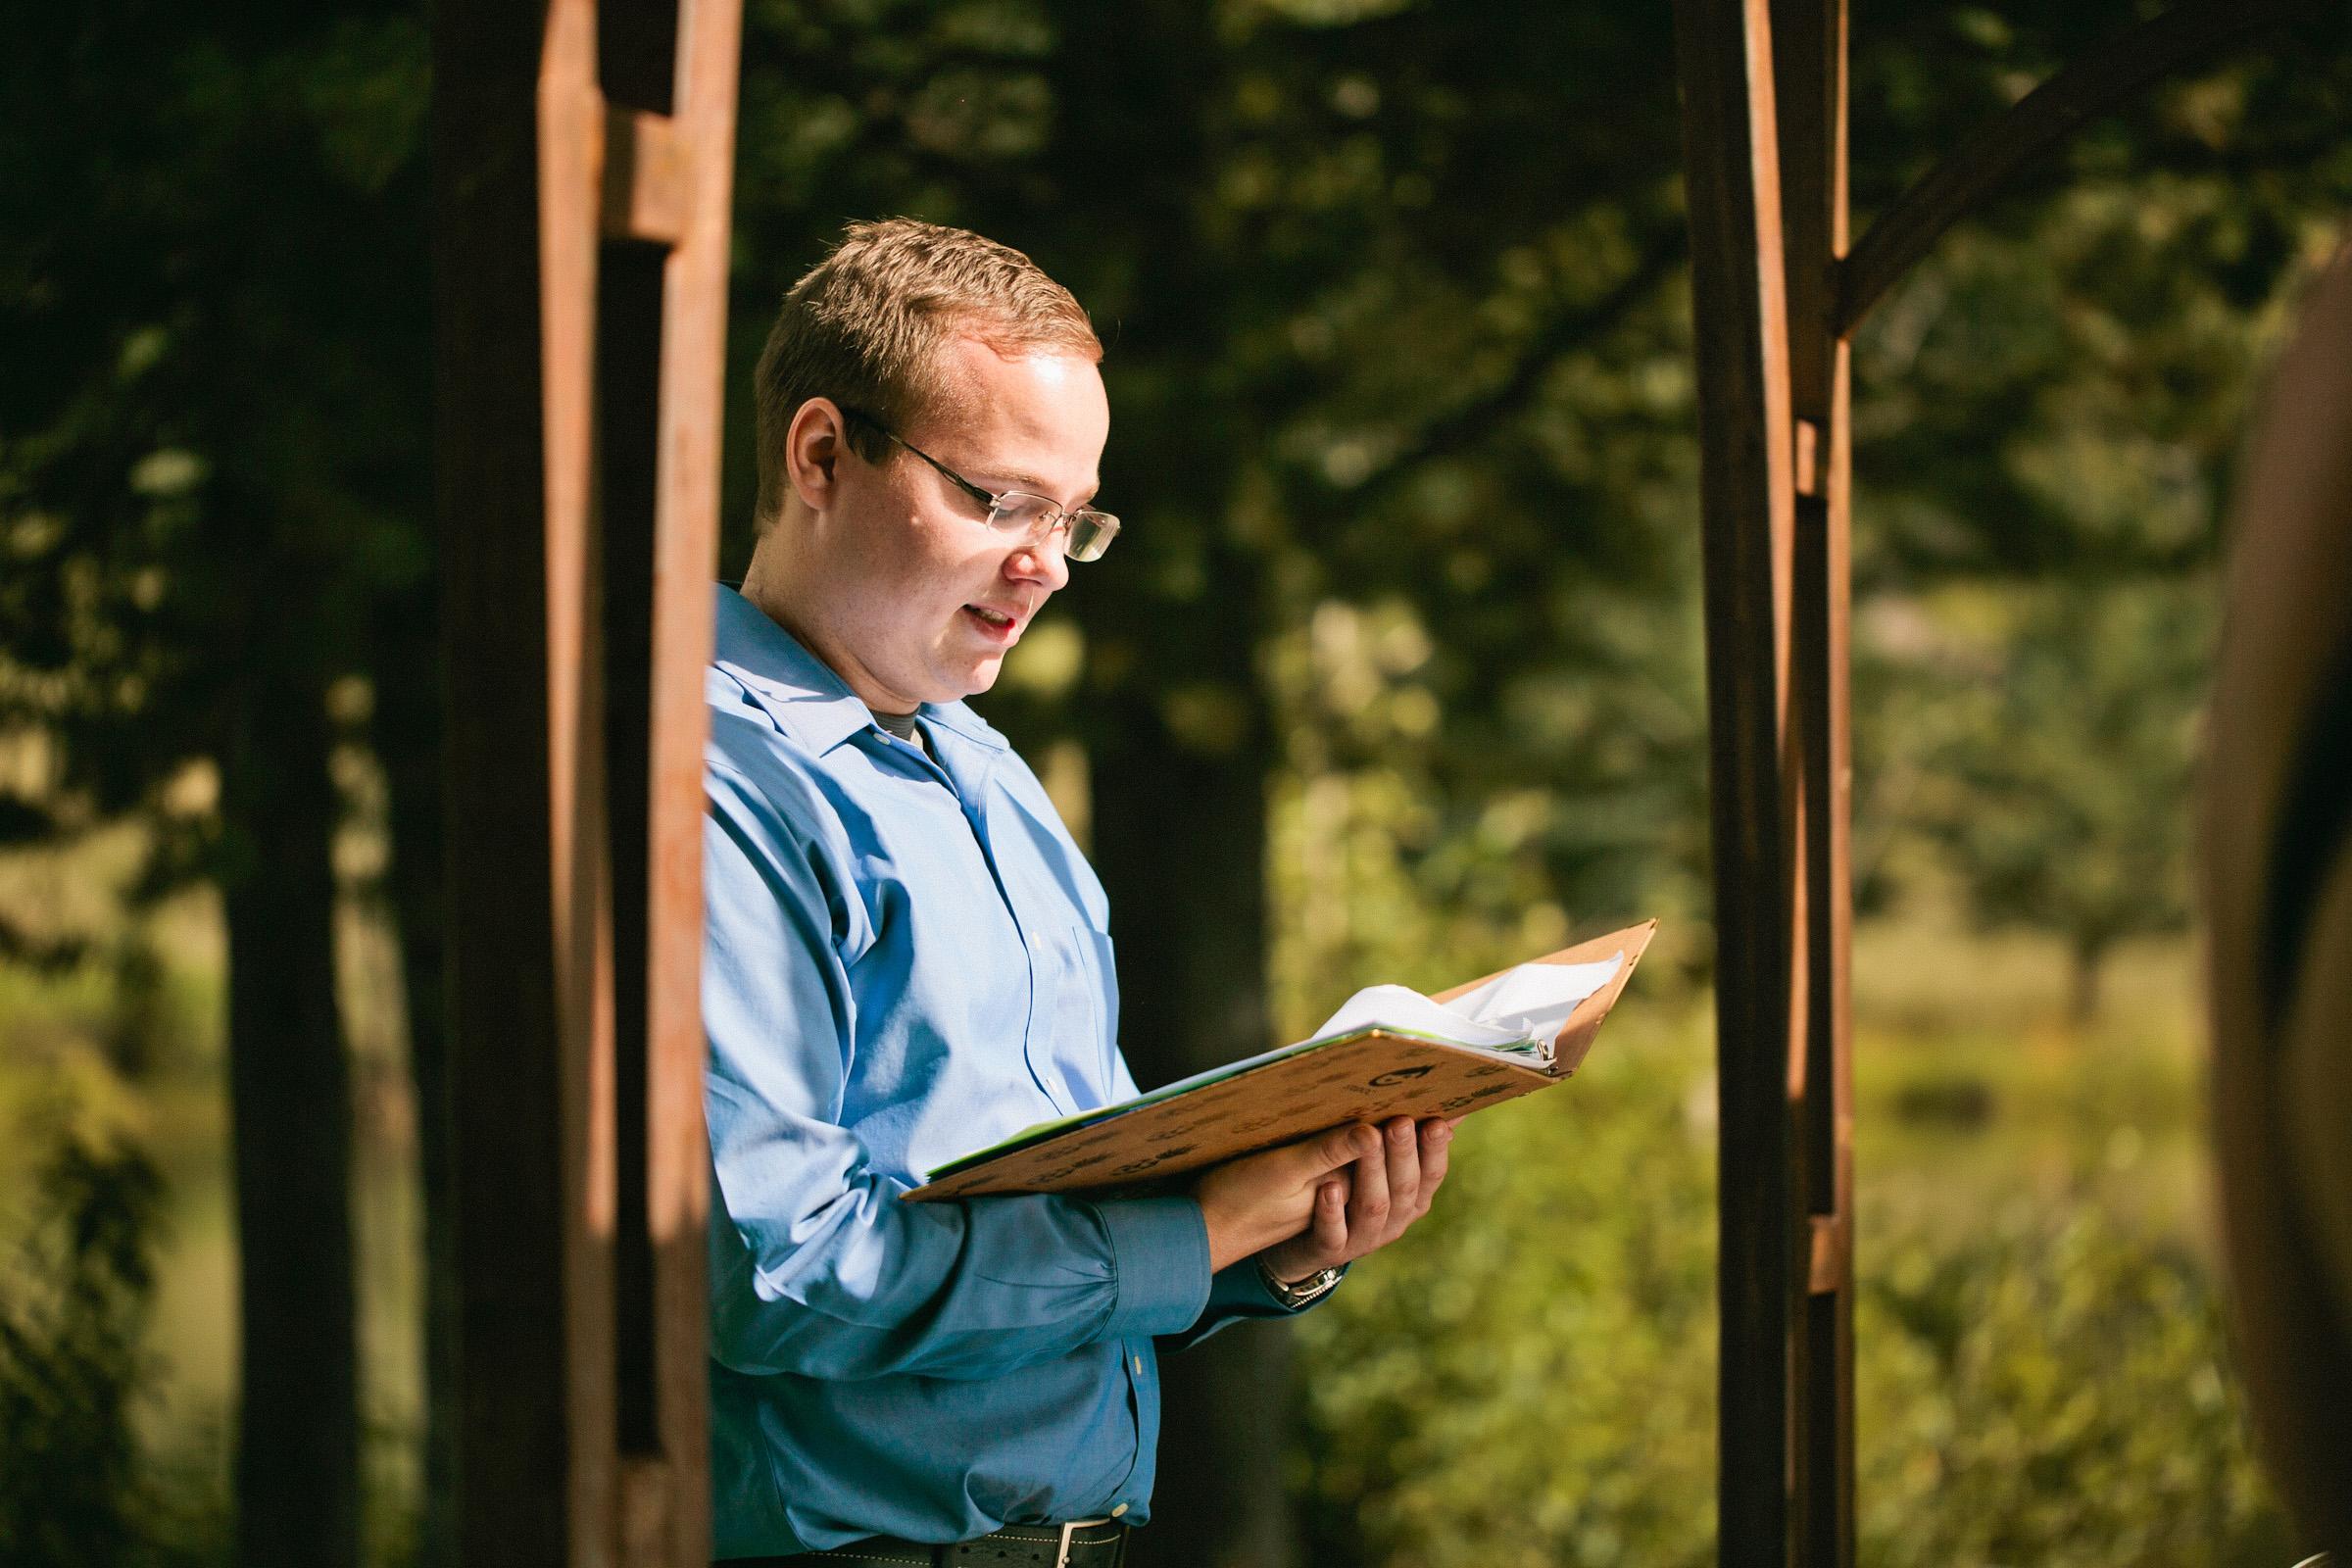 Colorado Mountain wedding photographer. Photographing in Keystone, Arapahoe Basin , Granby, Estes Park , Winter Park, Aspen, Leadville, Telluride , Silverton, Crested Butte, Breckenridge, Vail , Steamboat , and Durango.